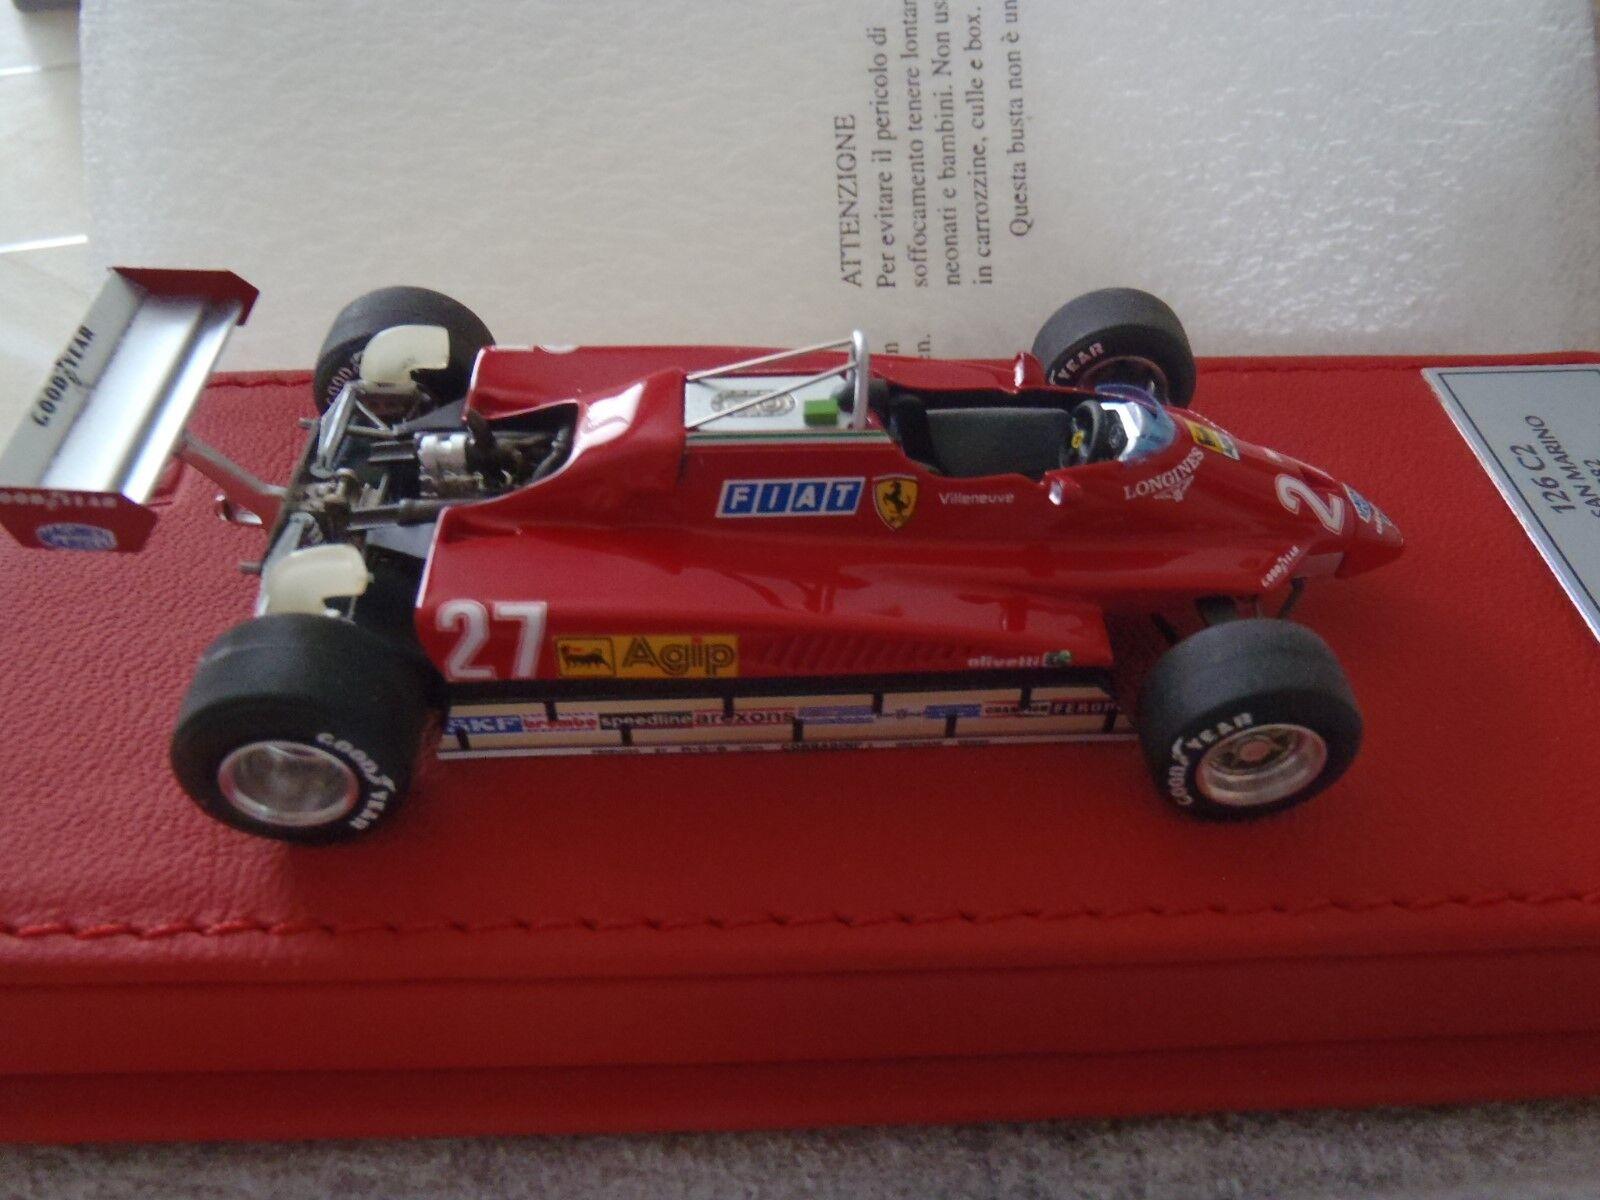 BBR 1 43 échelle 1982 Ferrari 126C2,  2 de 20, très rare, San Marino